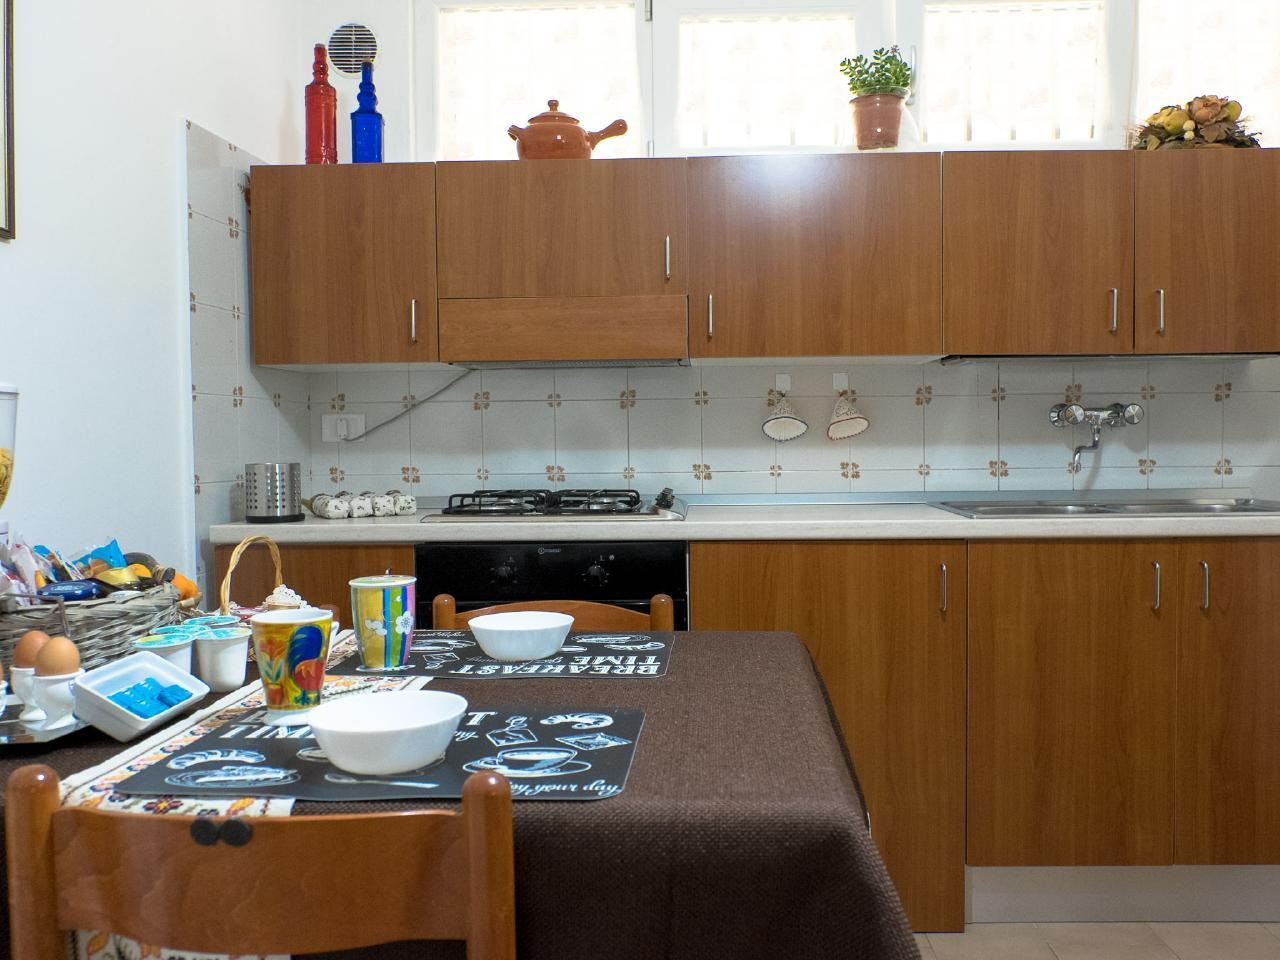 Ferienhaus Beim Schriftsteller zu Hause (2655674), Matera, Matera, Basilikata, Italien, Bild 6